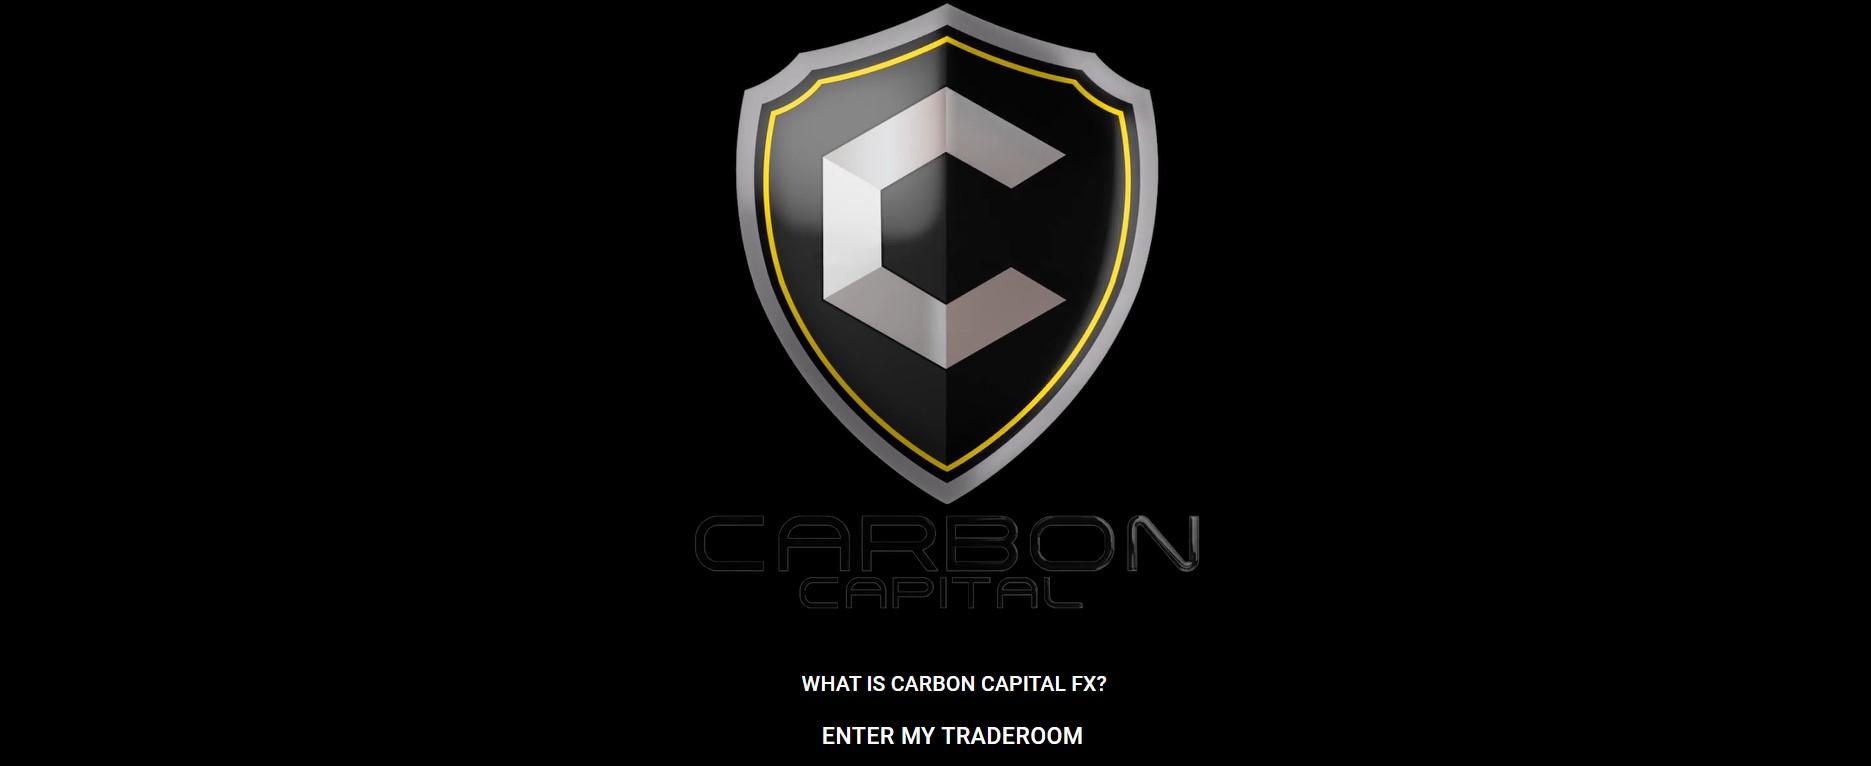 CarbonCapitalFX website